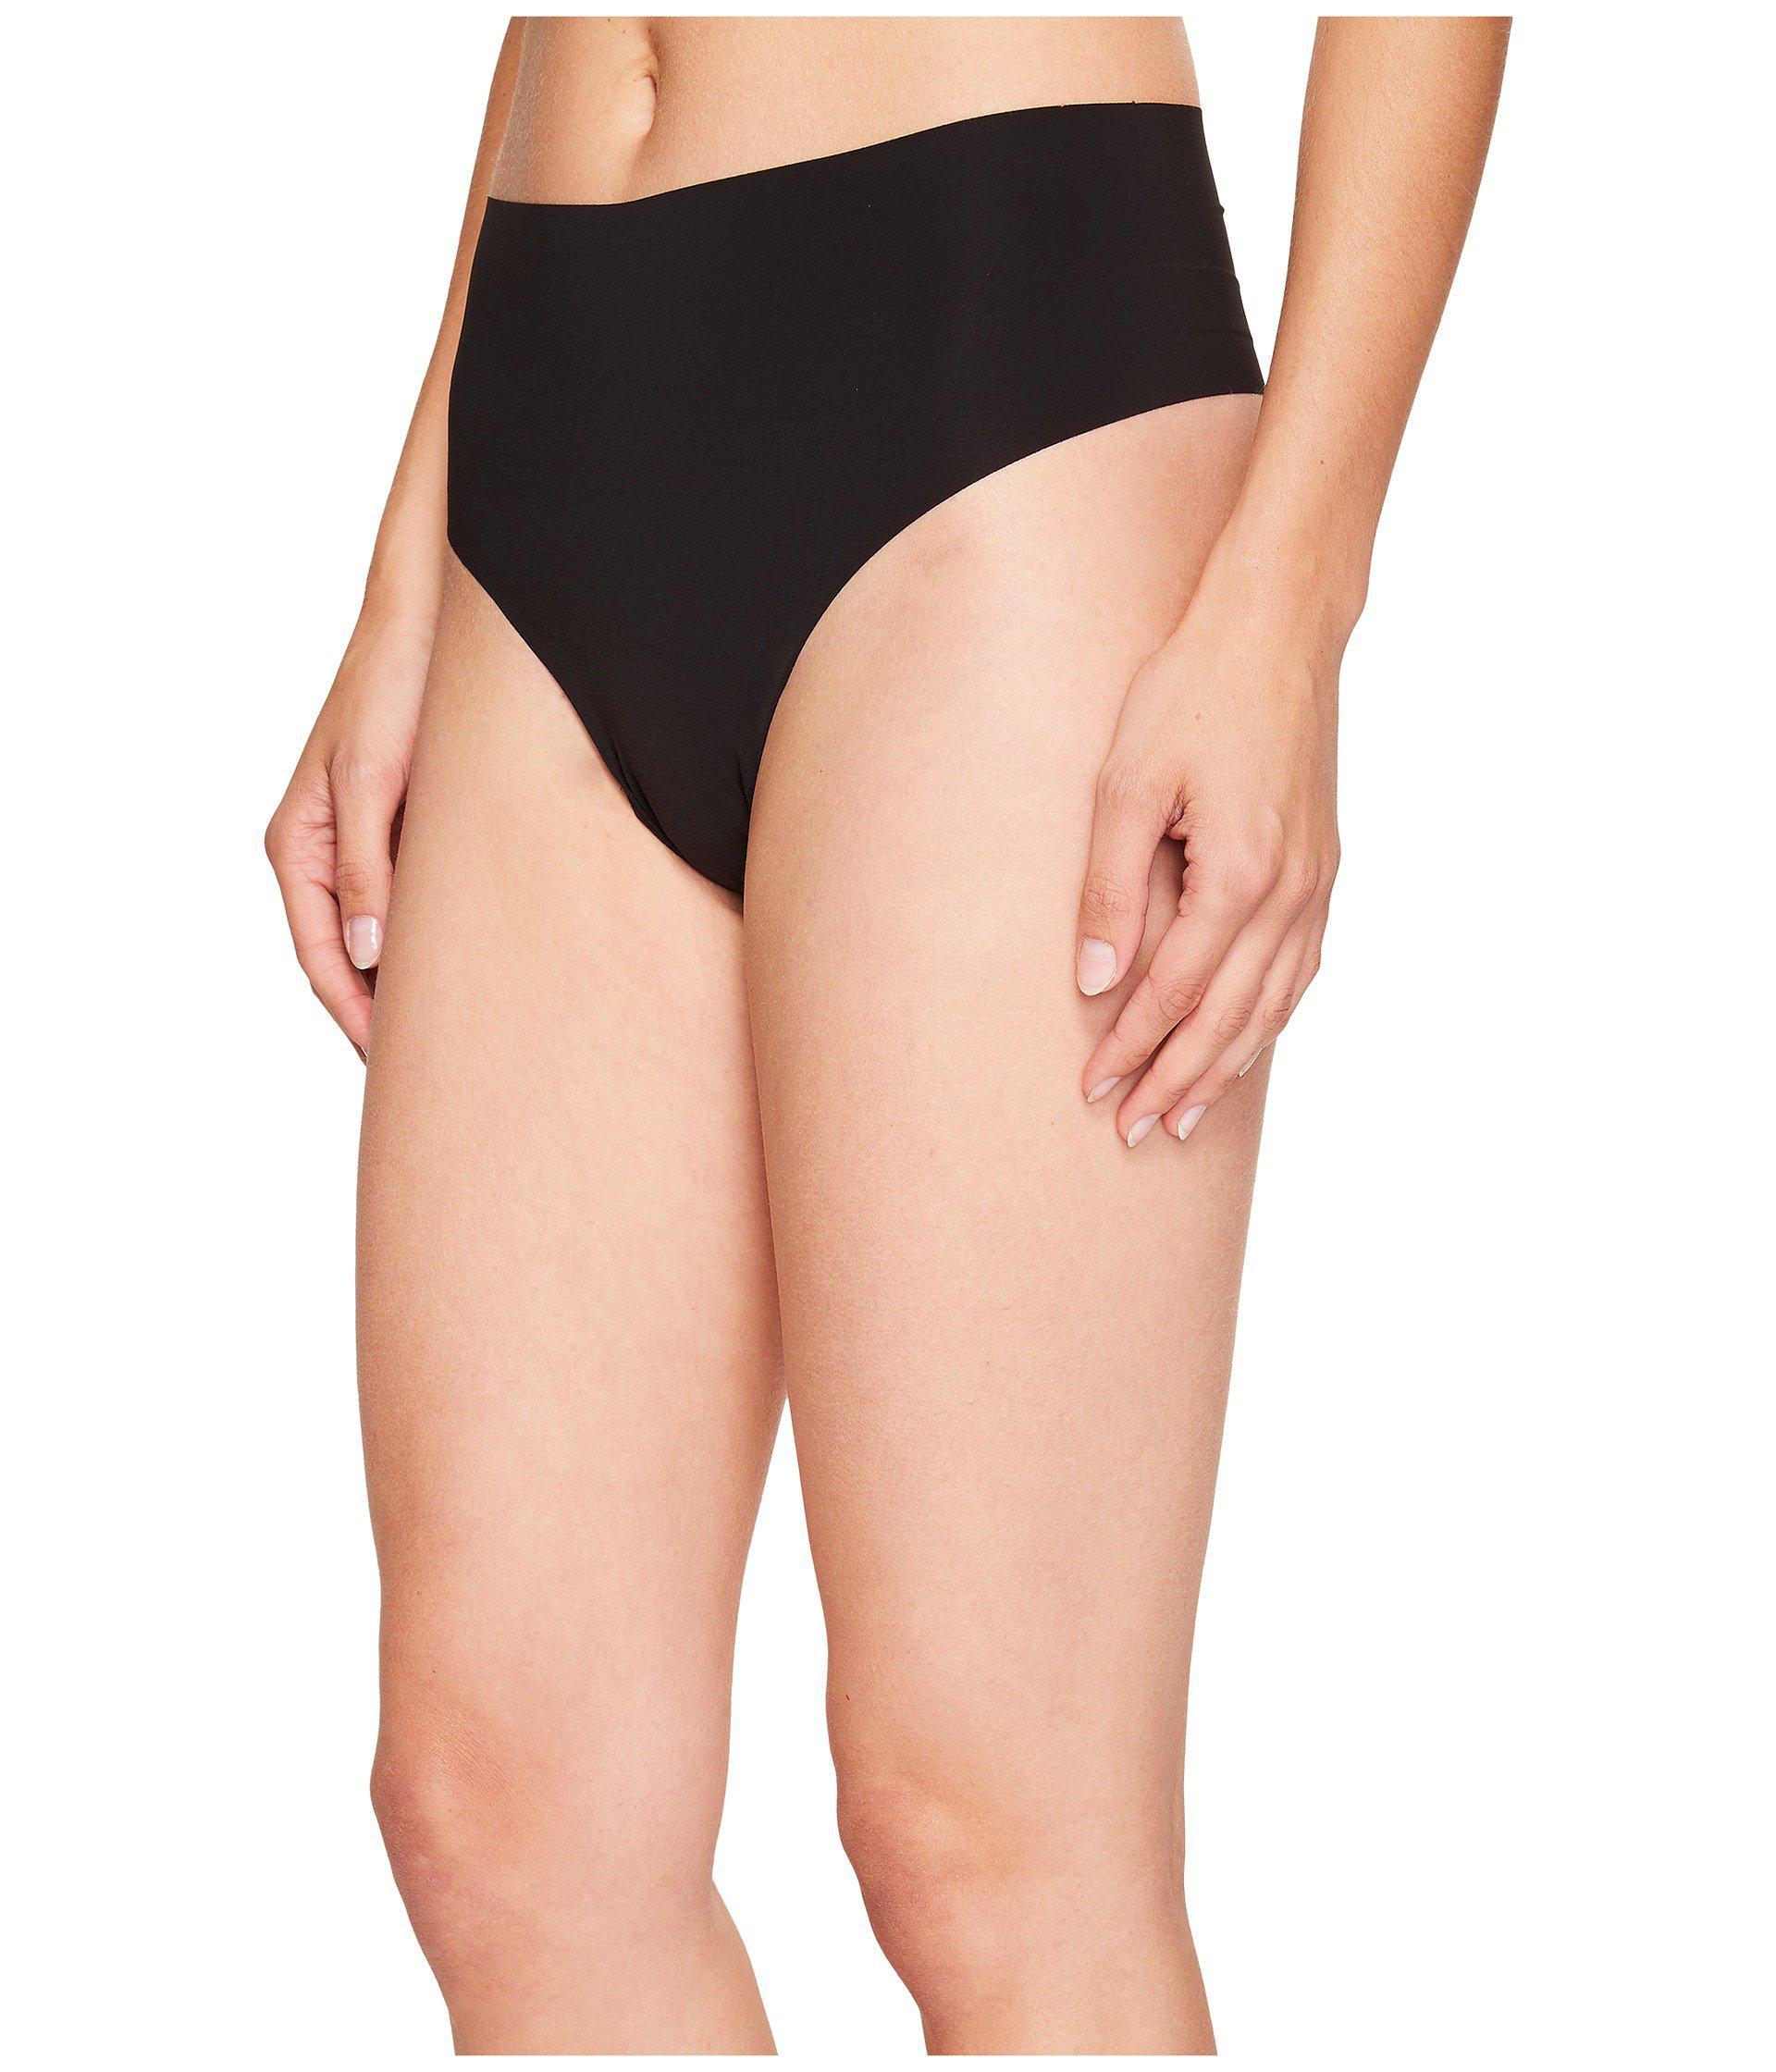 f2f96f5a18c52 Lyst - Commando Solid High-rise Thong Hrt01 (black) Women s Underwear in  Black